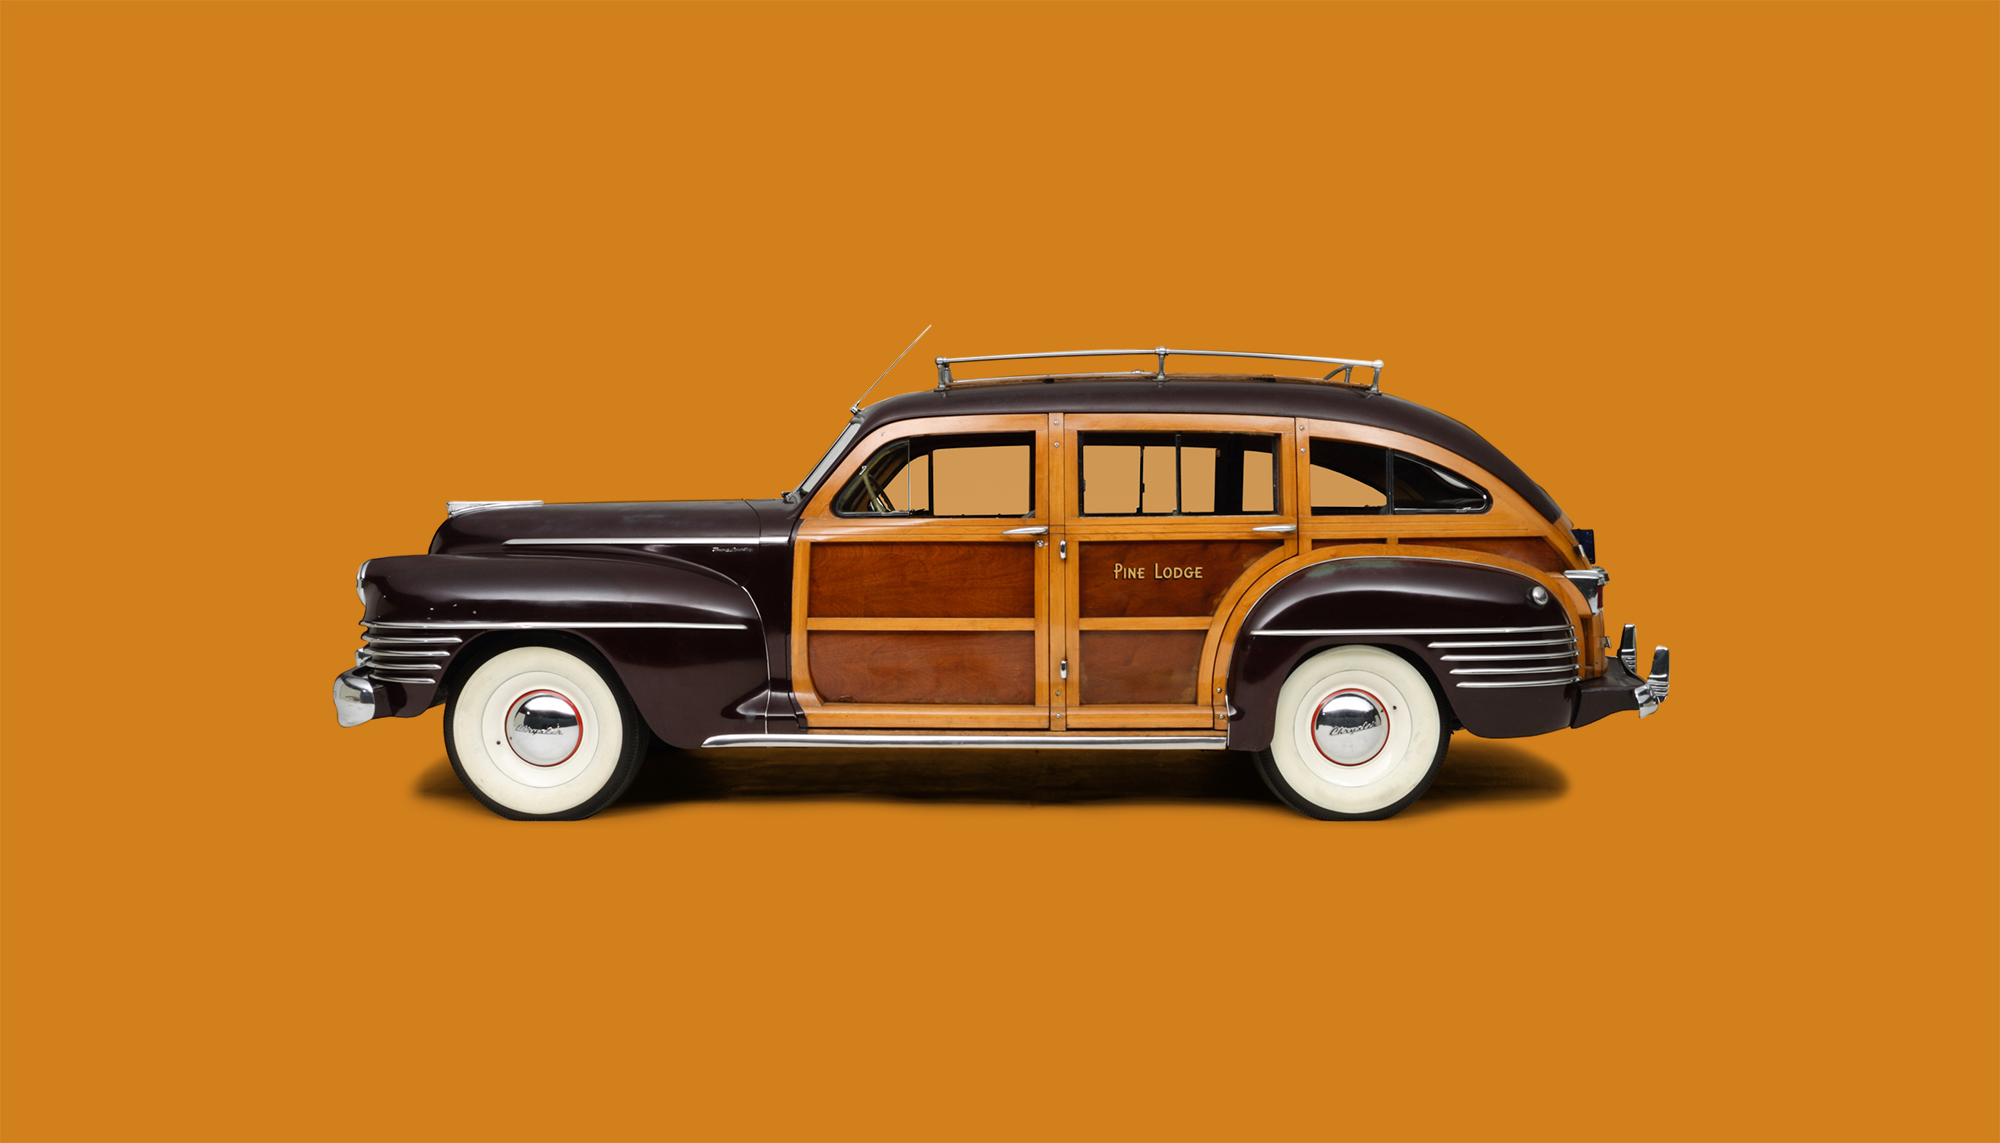 Bekijk Chrysler Town & Country Barrel Back Station Wagon in het Louwman Museum